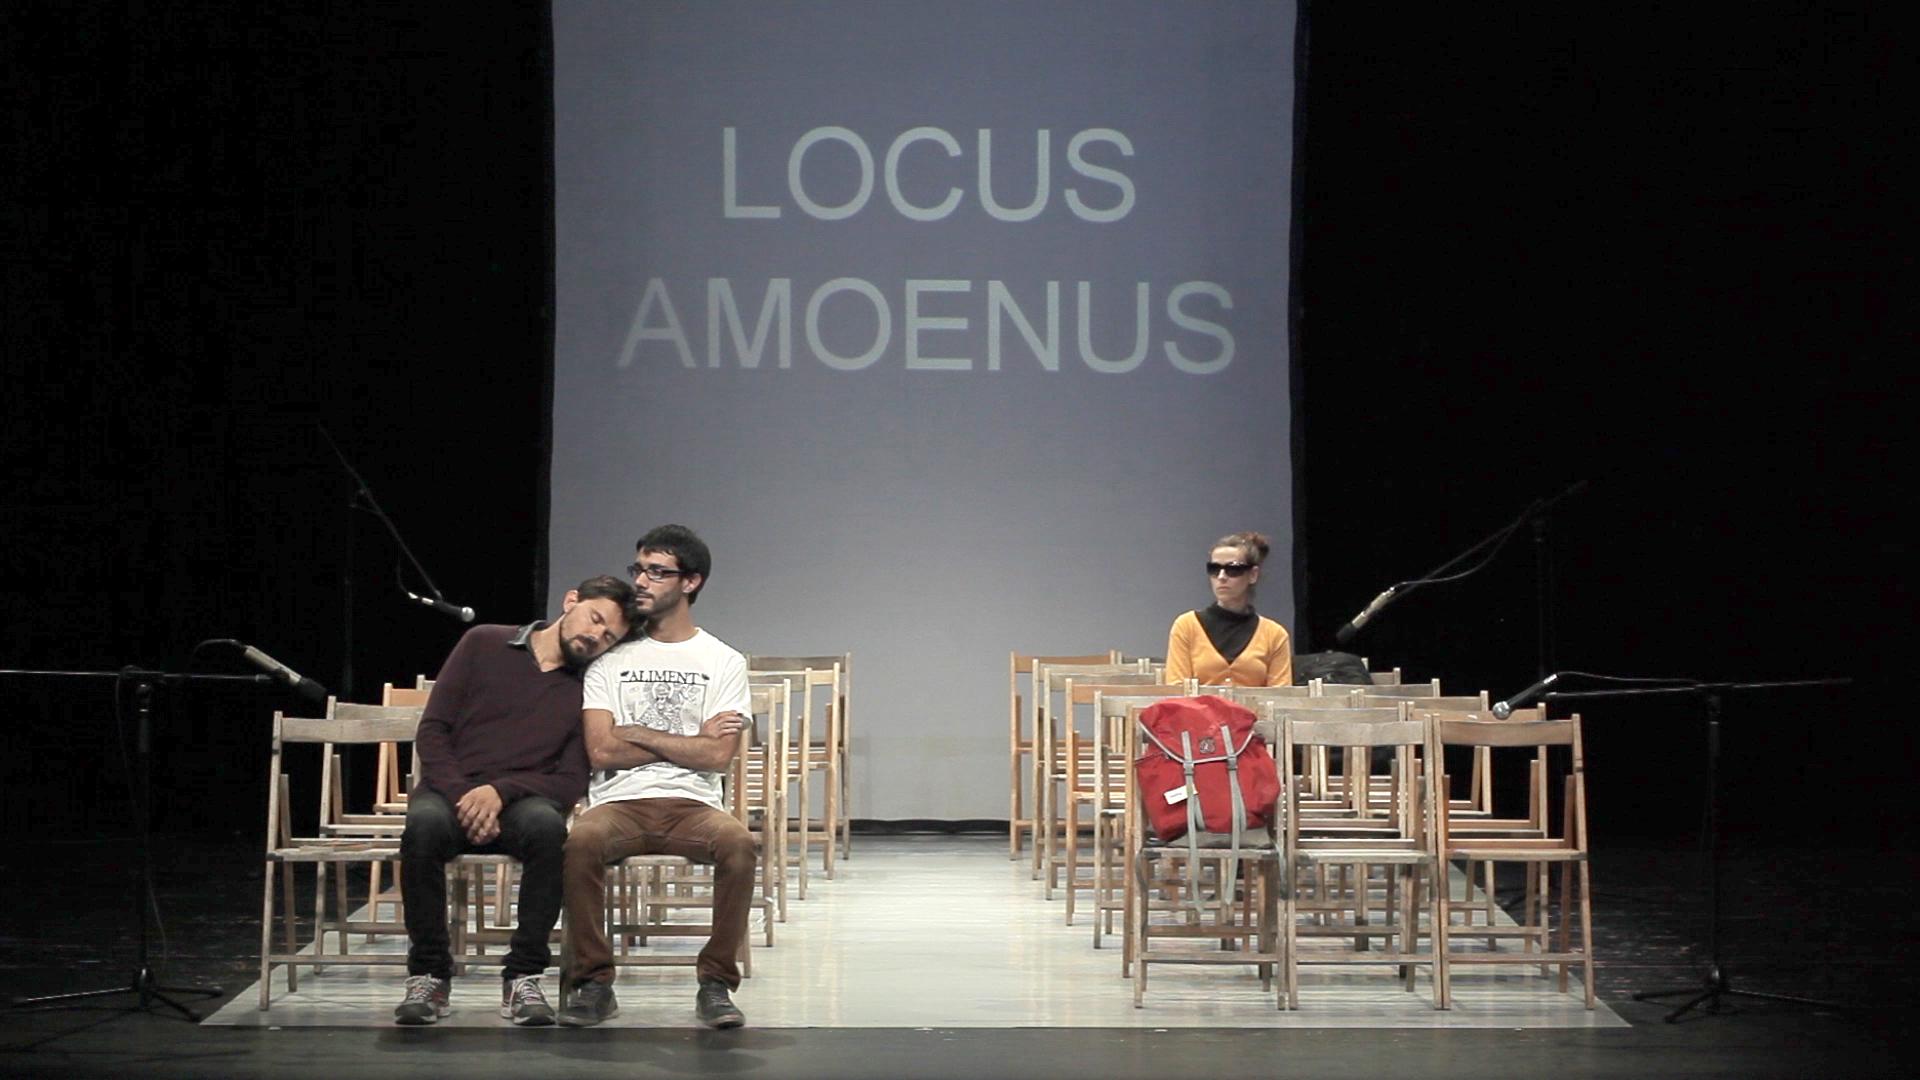 Locus Amoenus 1 (Aaron Sánchez)